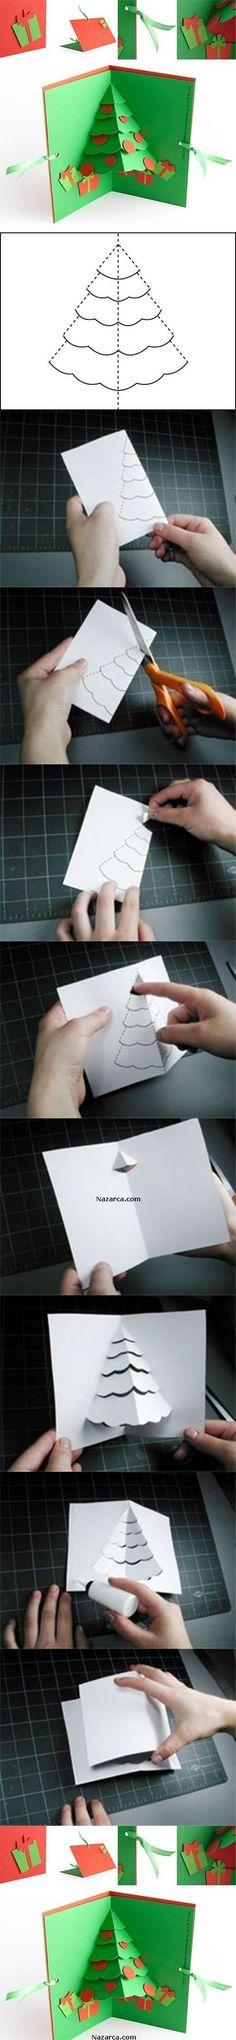 Christmas tree pop up card